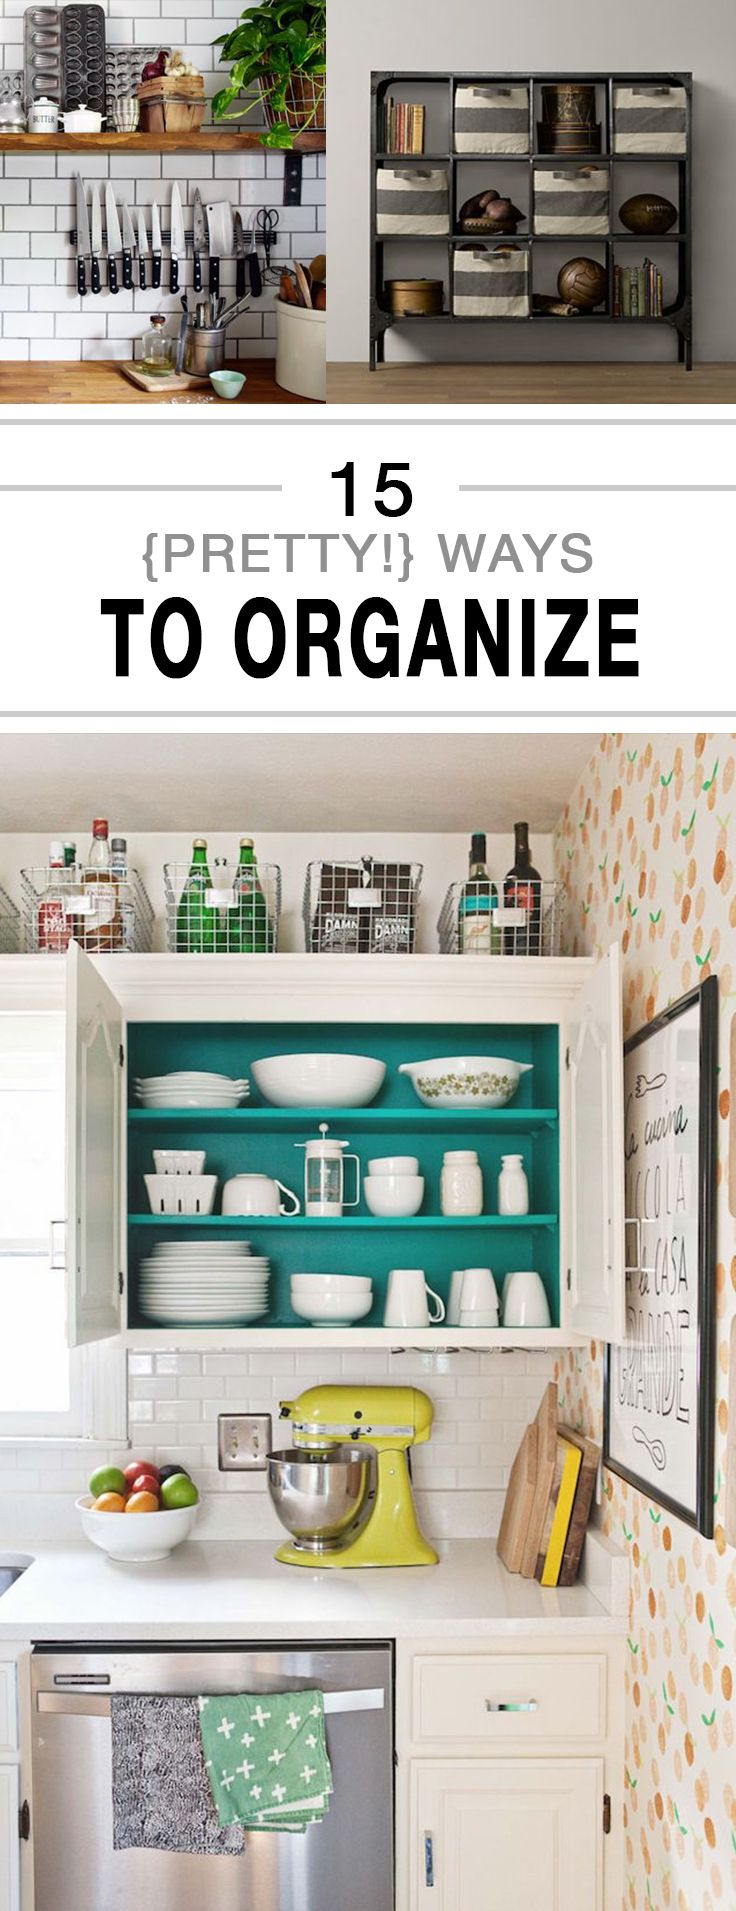 Organization, organization hacks, pretty ways to organize, pretty organization, popular pin, interior design hacks, home decor ideas, organization inspiration.